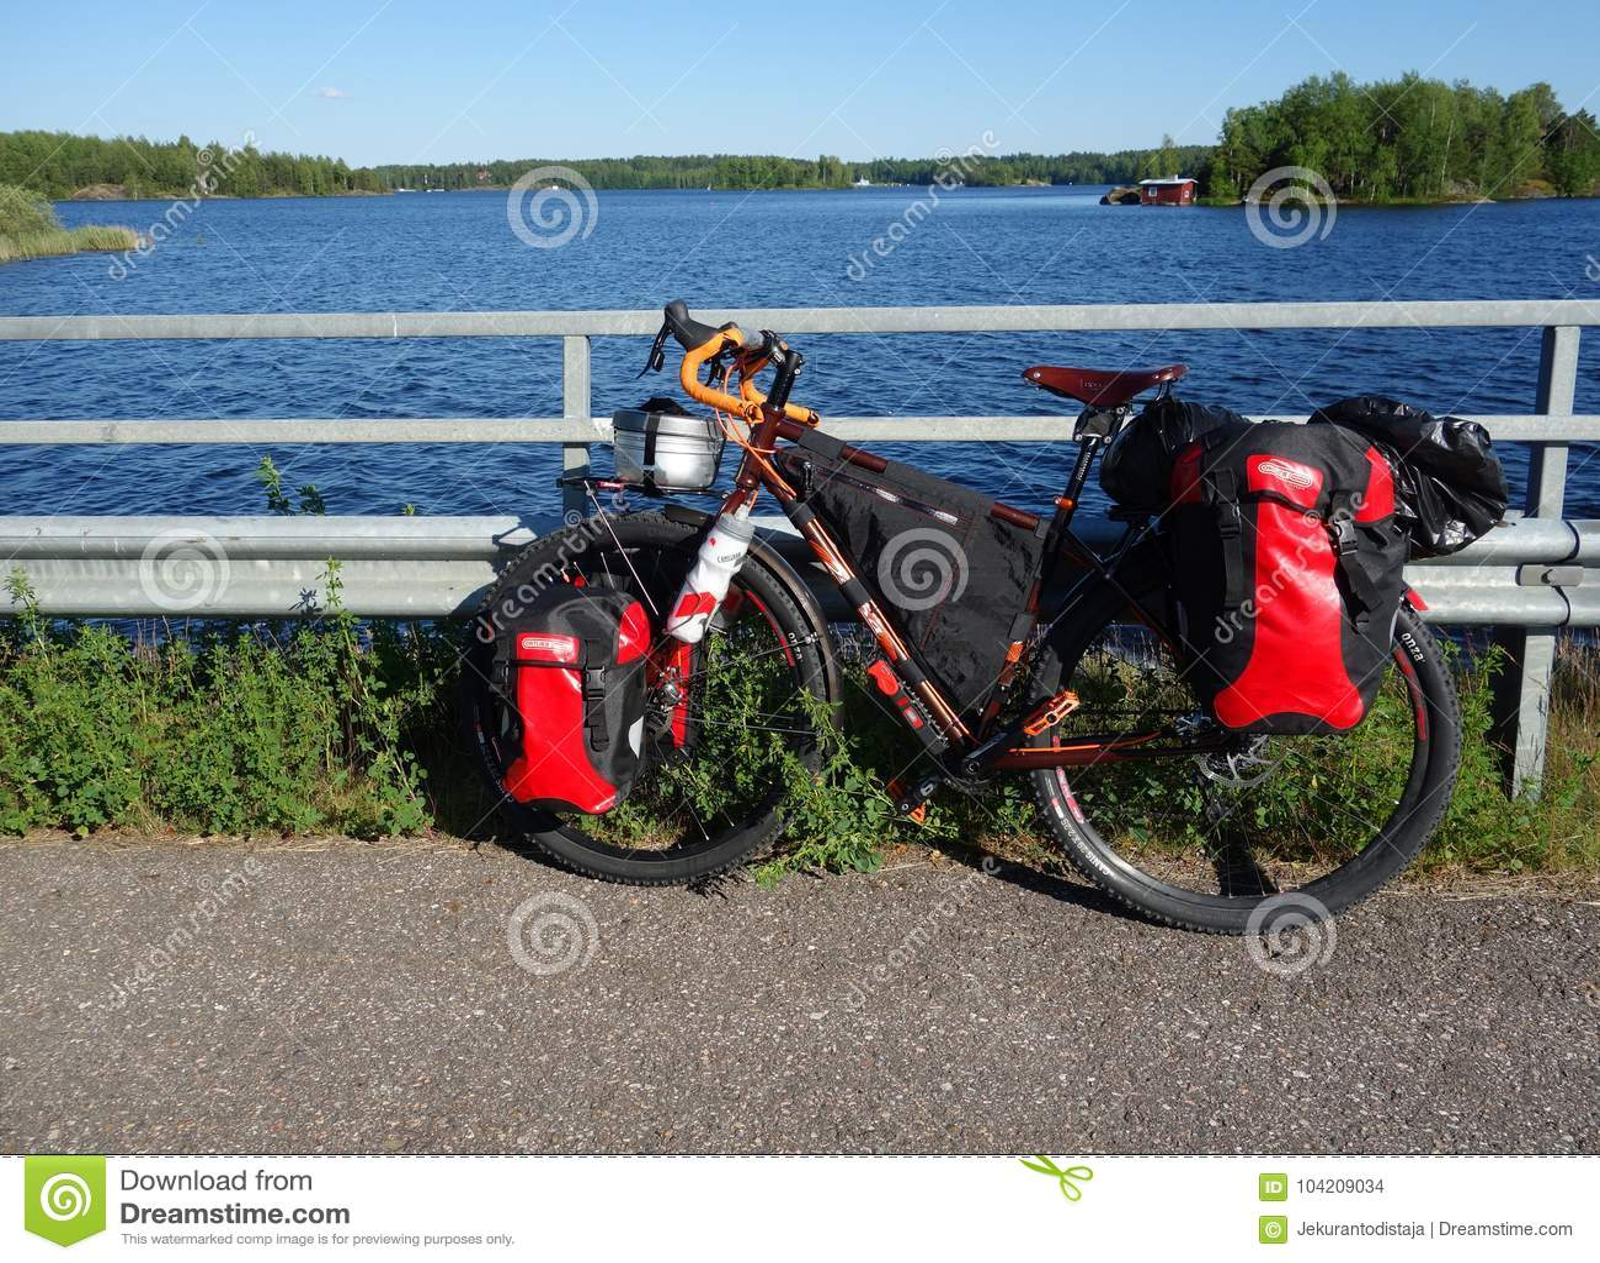 Adventure touring bike by lake Saimaa on summer evening